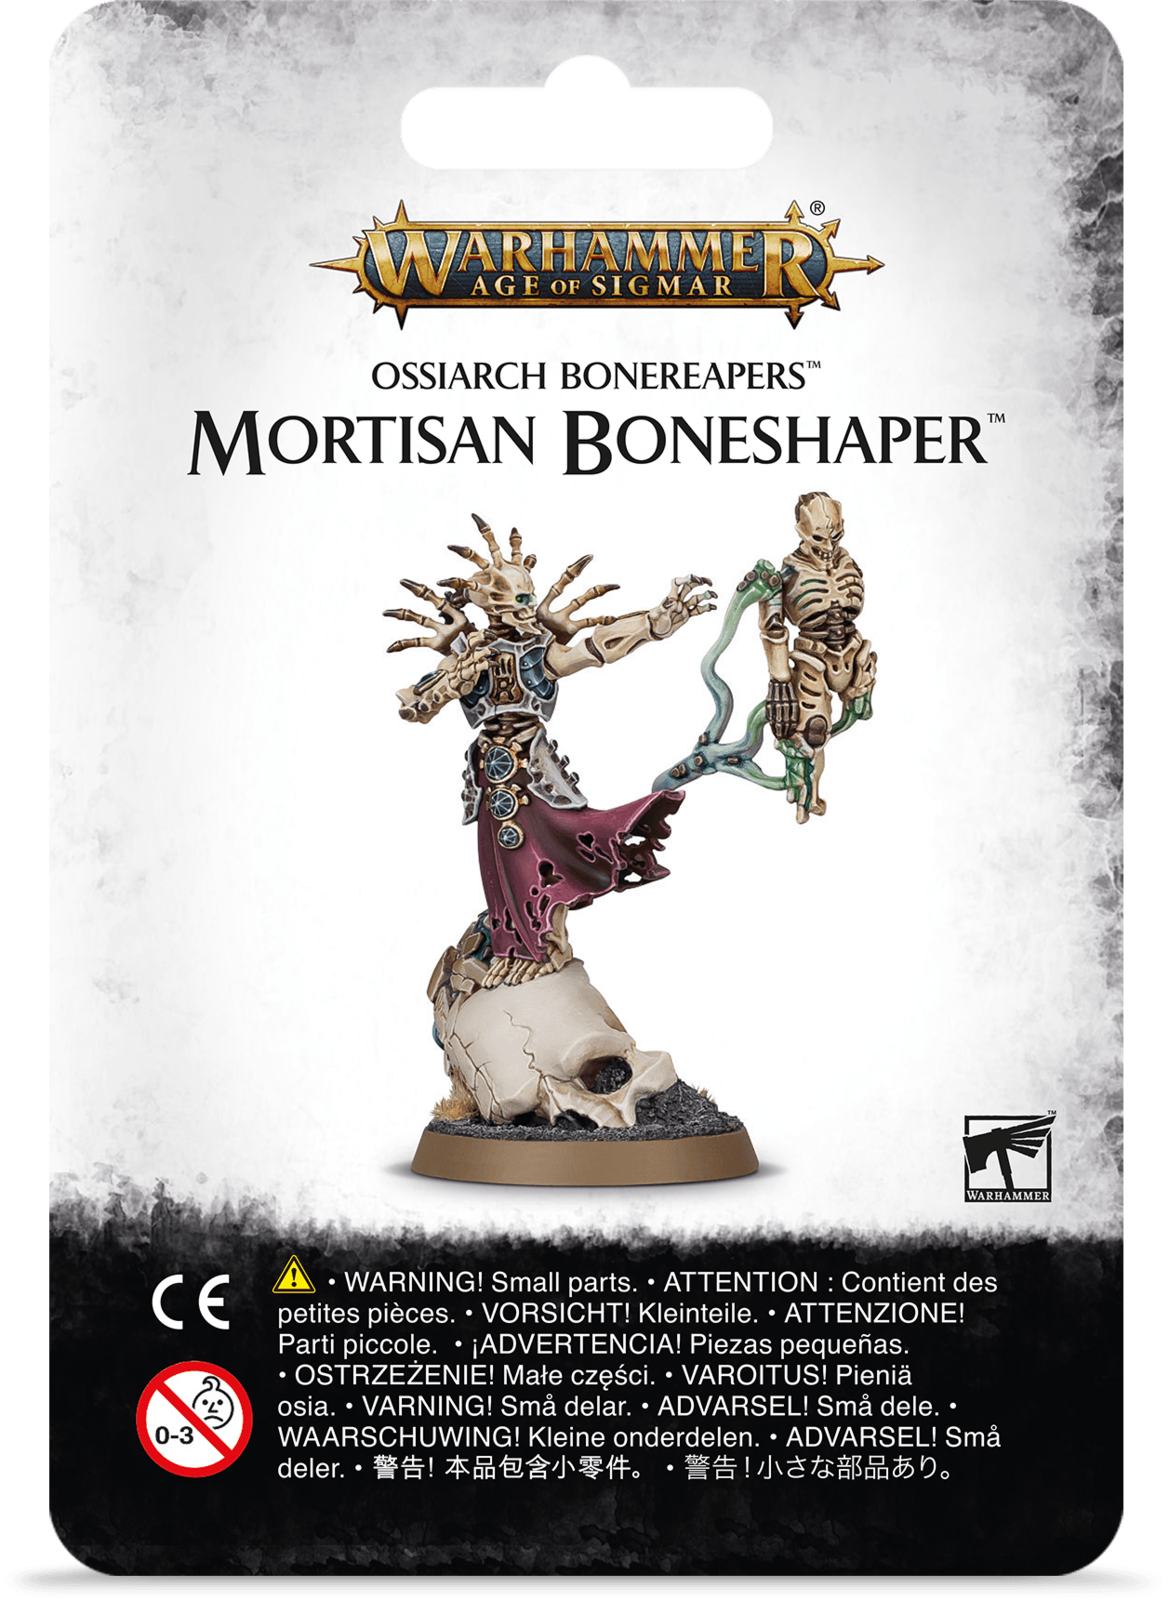 Warhammer Age of Sigmar: Ossiarch Bonereapers Mortisan Boneshaper image